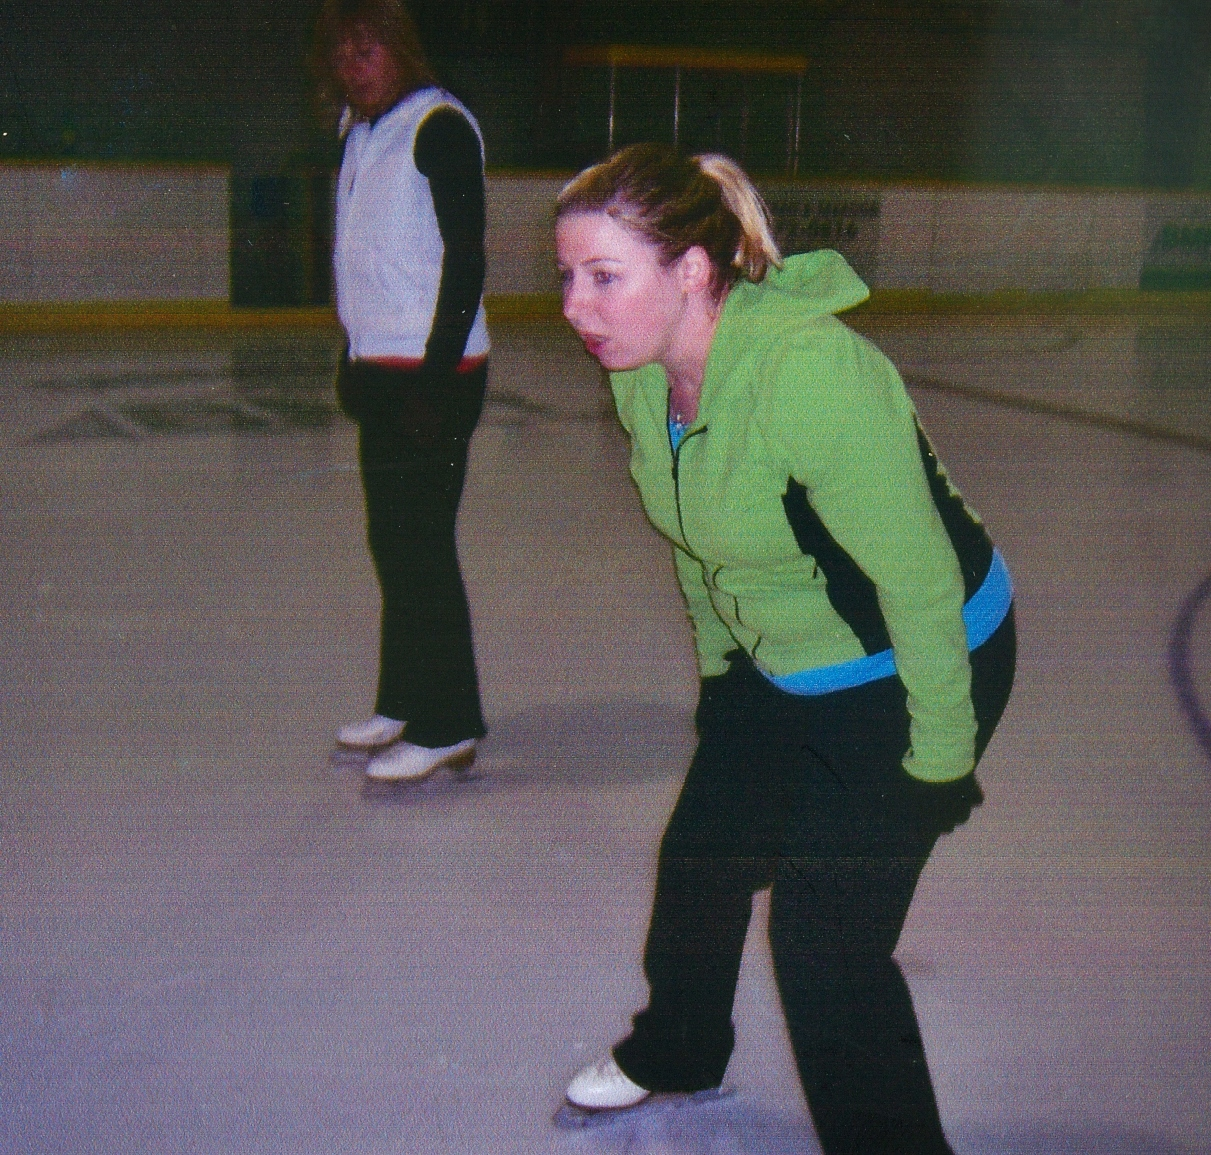 Coach Lindsay Cher